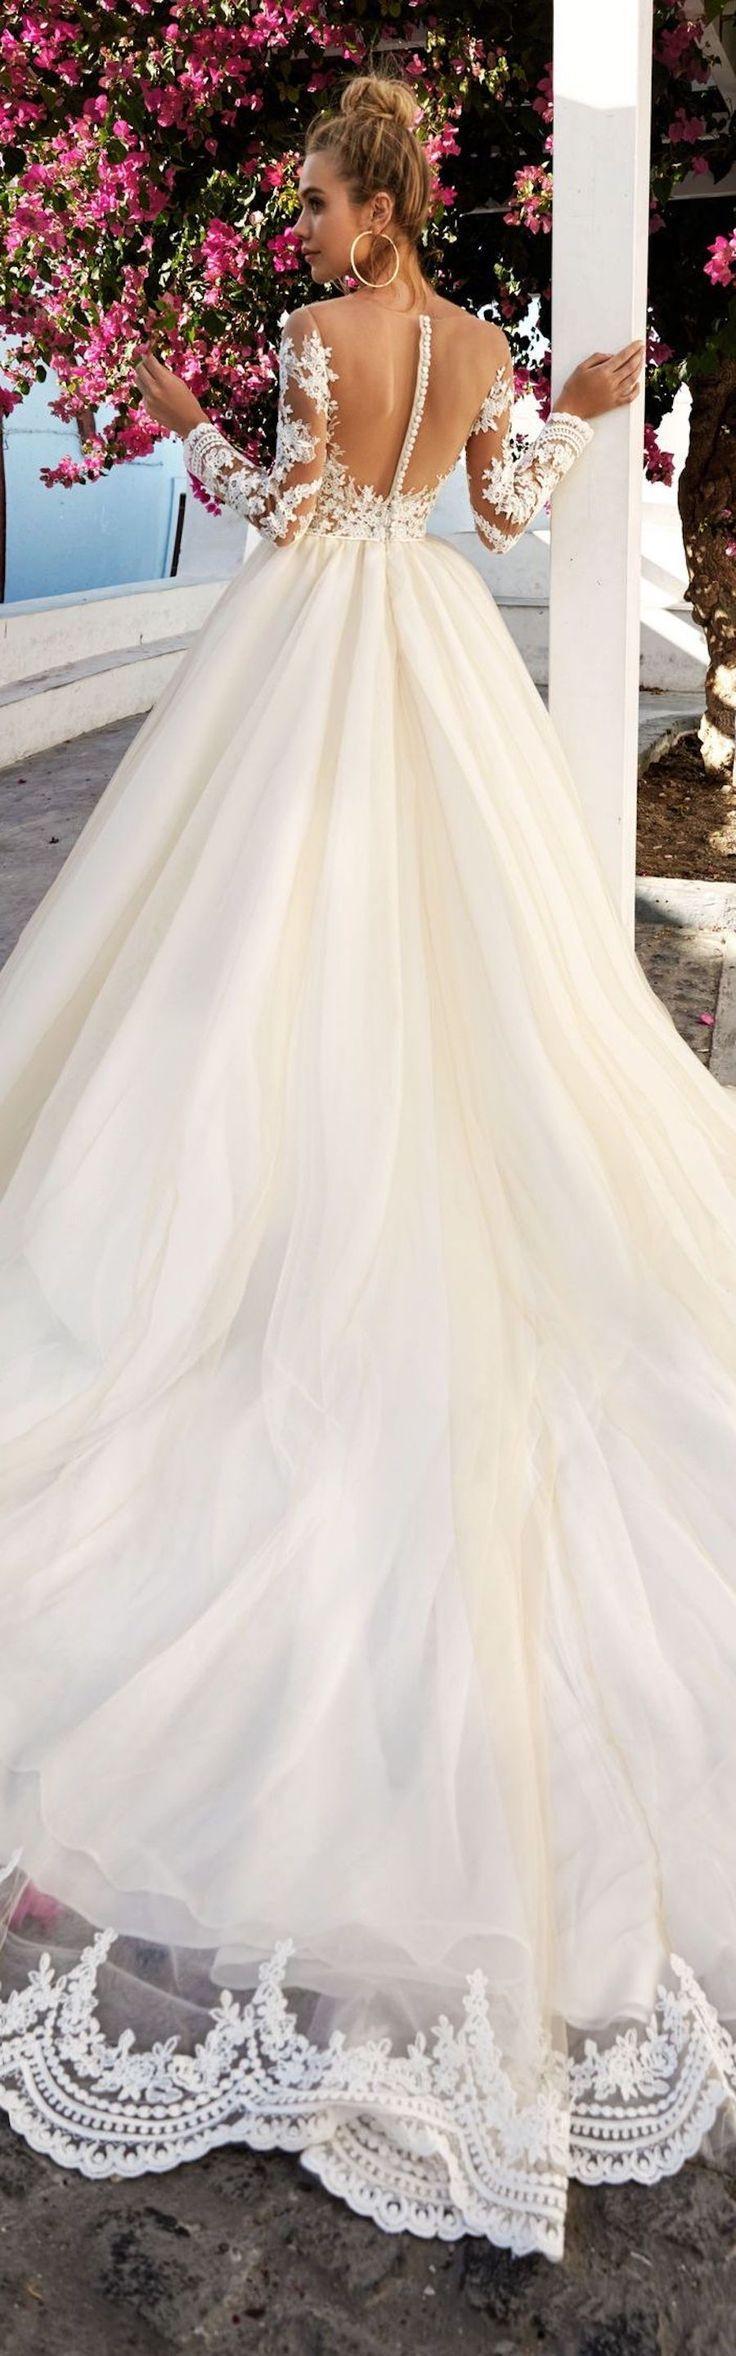 Wedding - Eva Lendel Wedding Dress Collection 2017